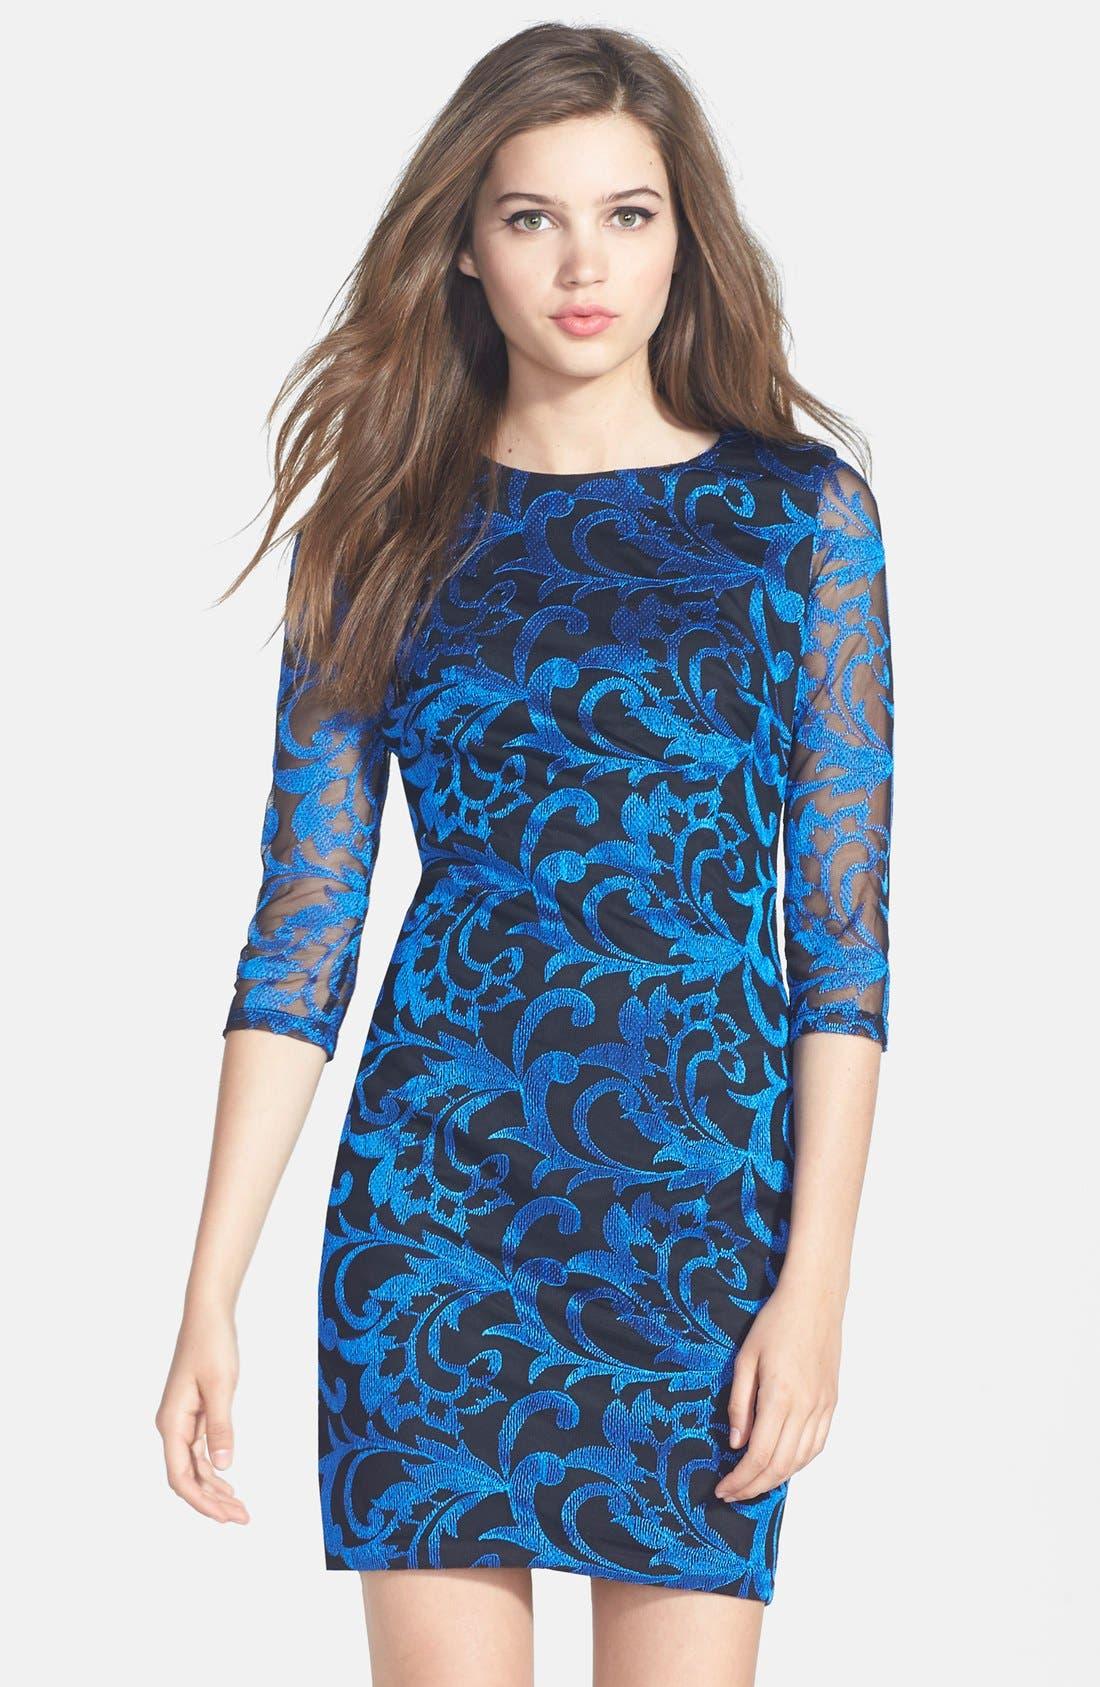 Main Image - Alexia Admor Embroidered Mesh Body-Con Dress